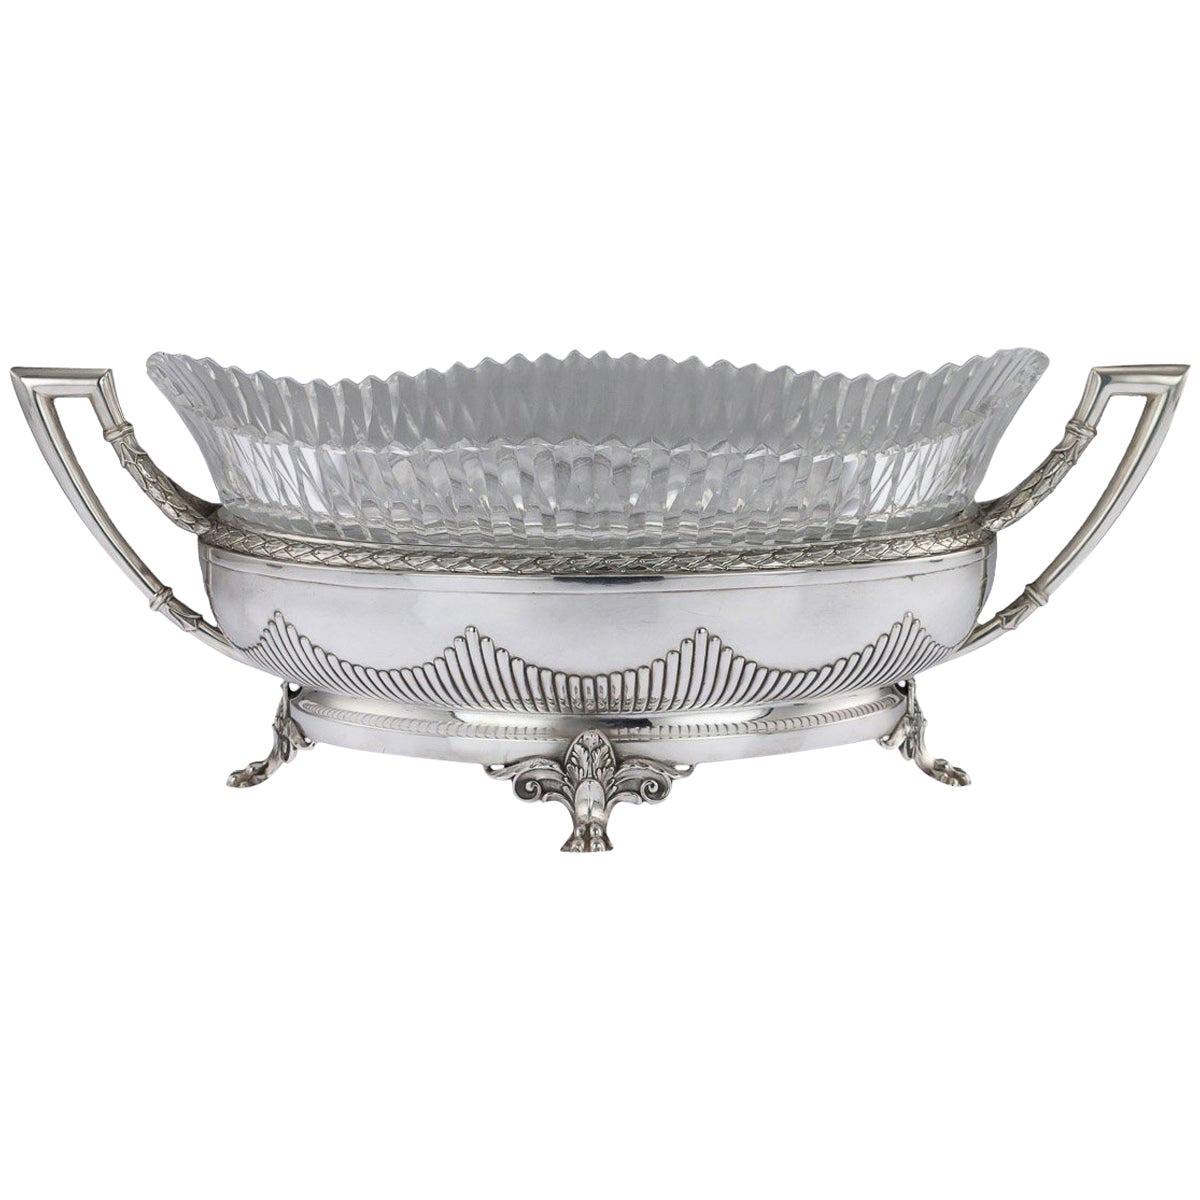 20th Century Russian Empire Solid Silver and Glass Jardinière, Bolin, circa 1910